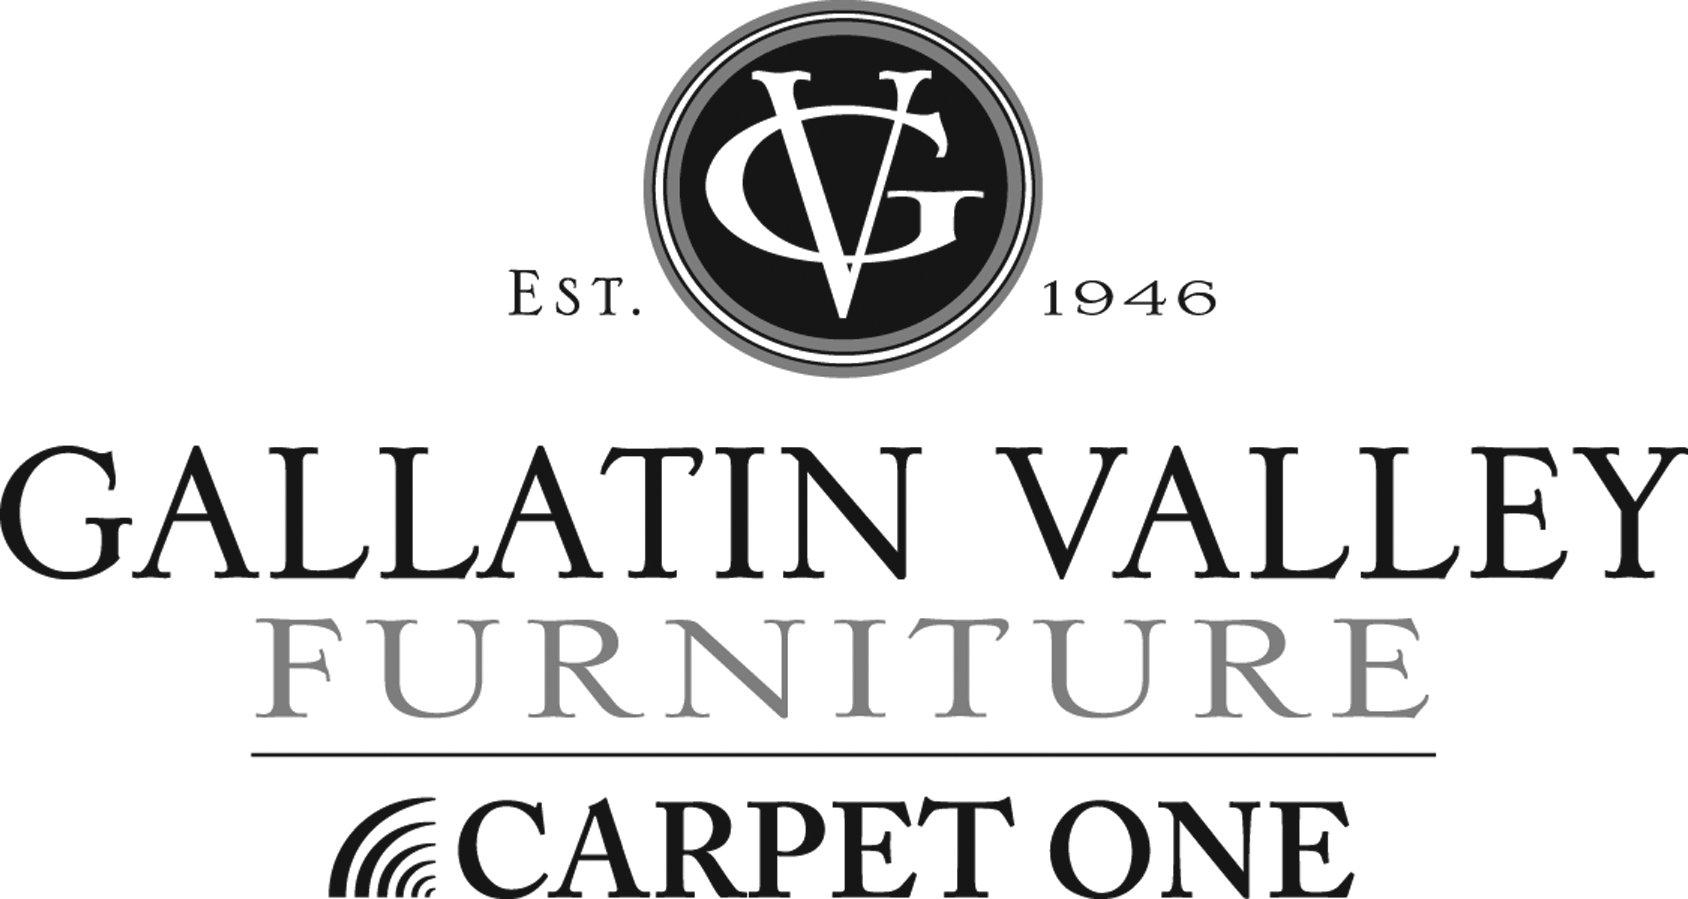 Superb Gallatin Valley Furniture Carpet One